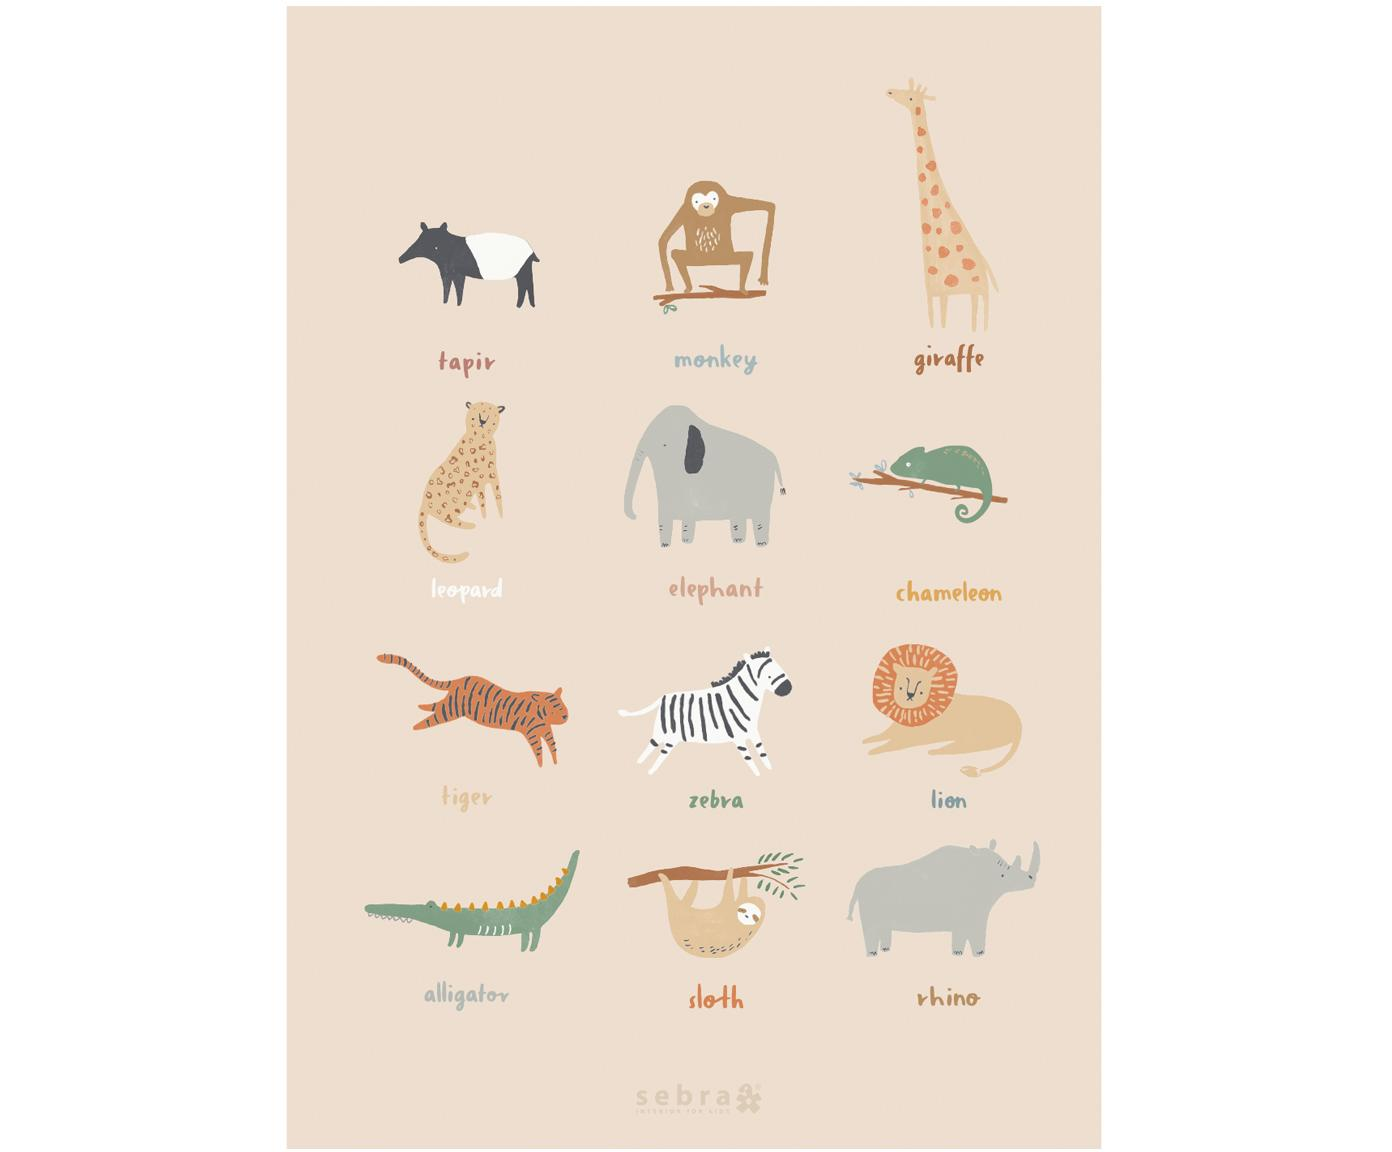 Poster Wildlife, Kunstdruckpapier, 250g/m², Mehrfarbig, 50 x 70 cm